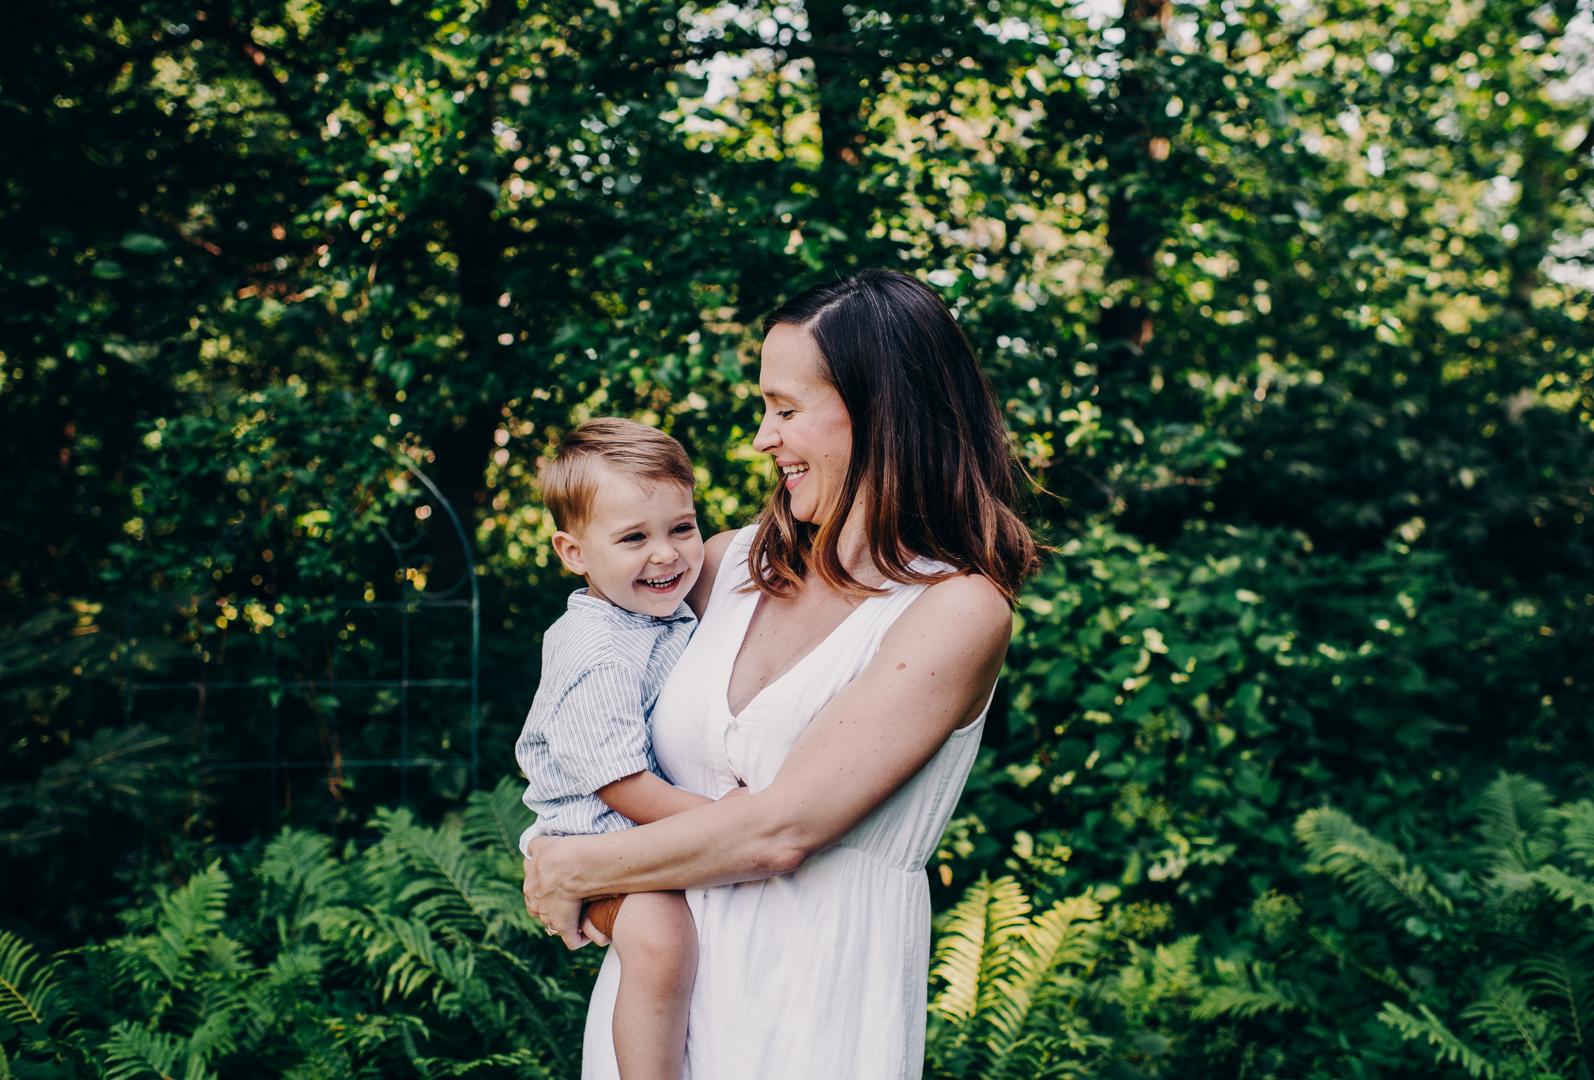 TerraSuraPhotography-Sloane Vasseur Family Newborn-Web-5174.jpg